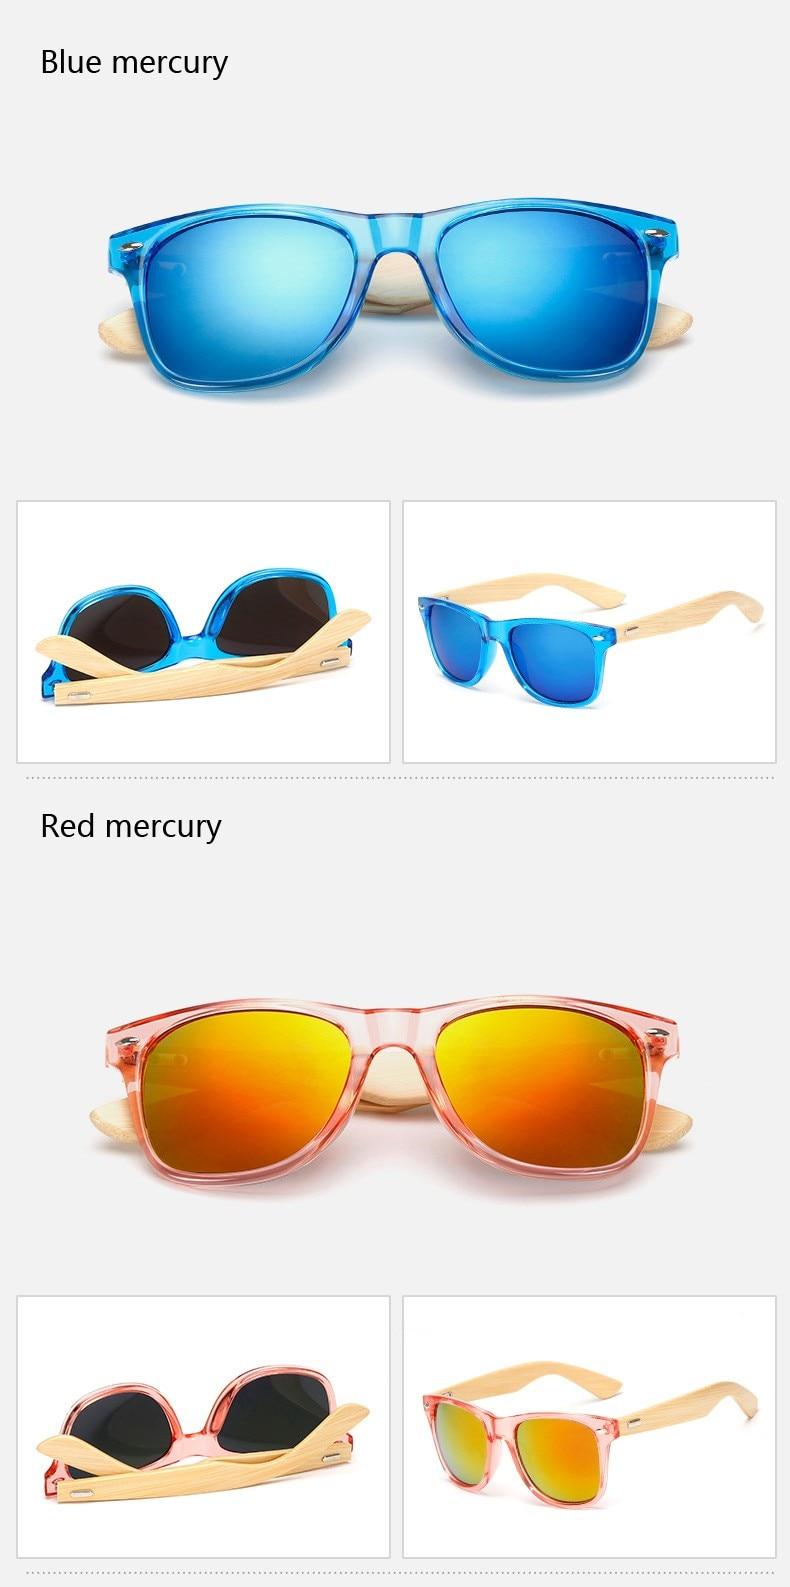 Ralferty Retro Wood Sunglasses Men Bamboo Sunglass Women Brand Design Sport Goggles Gold Mirror Sun Glasses Shades lunette oculo 13